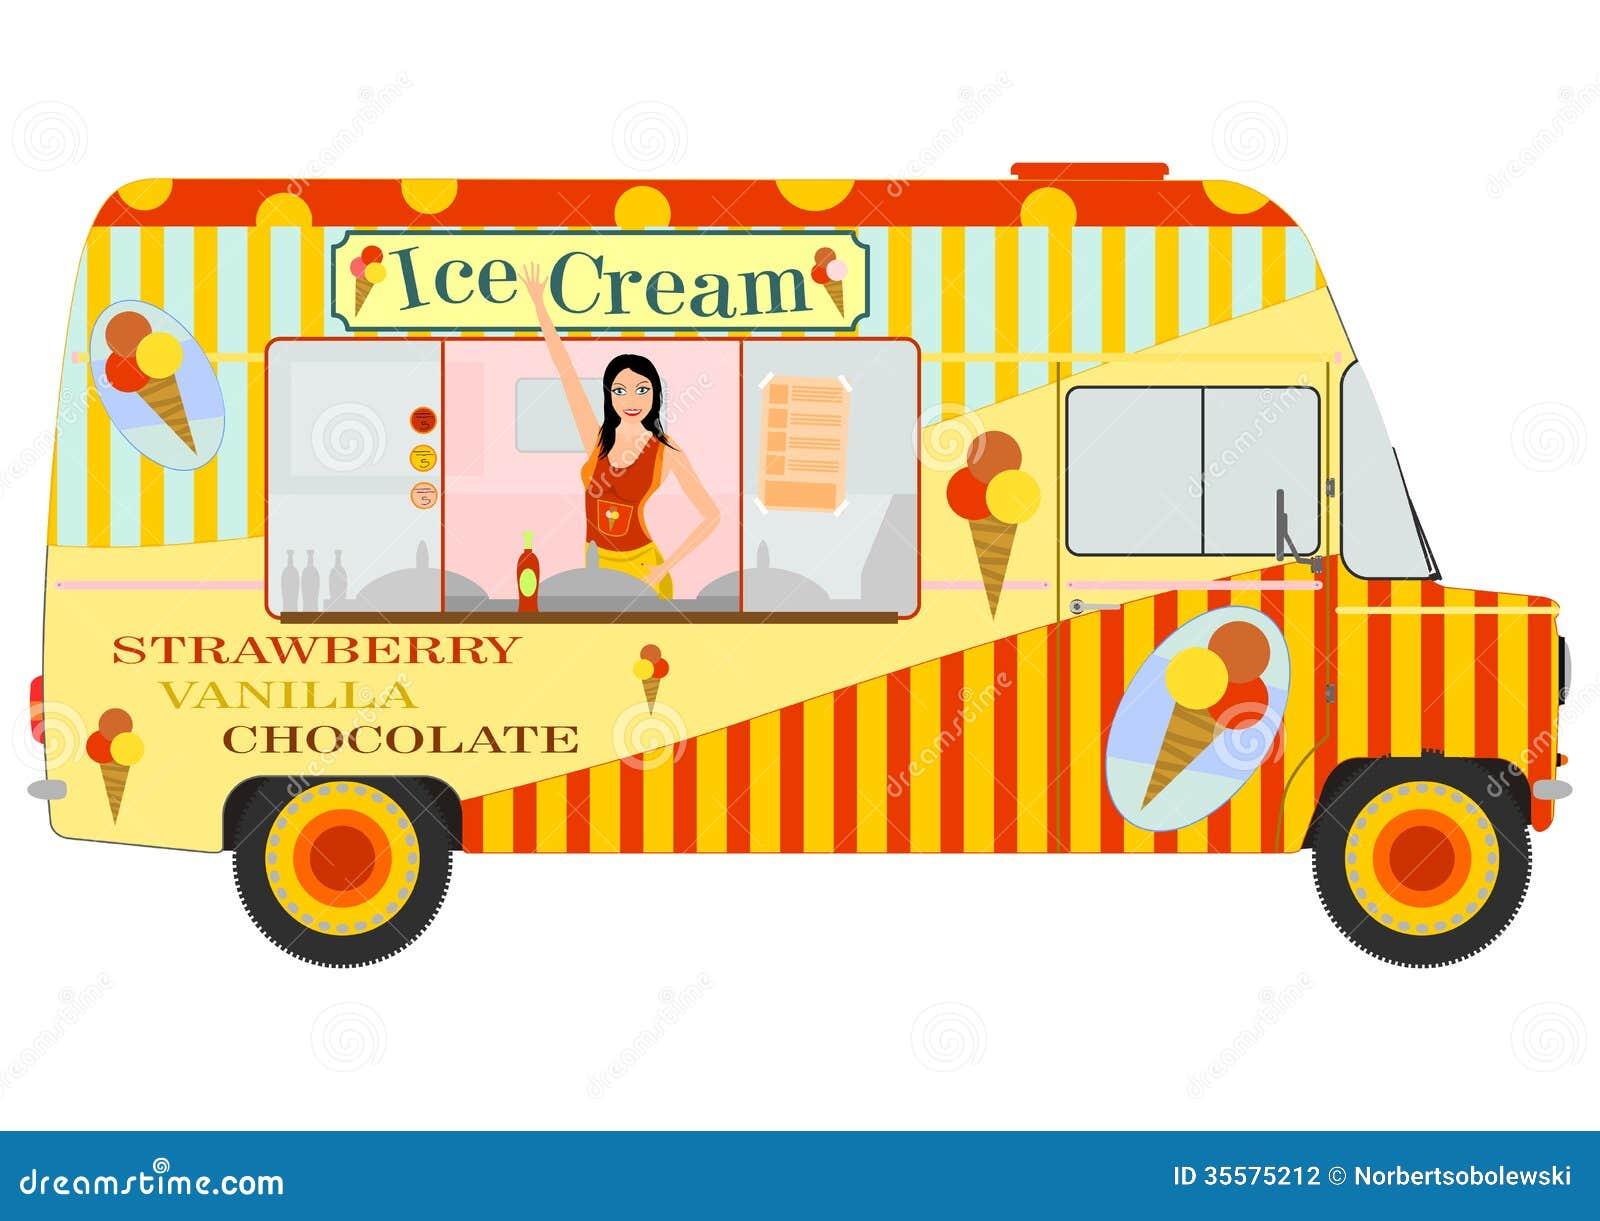 Ice Cream Van With Girl Inside Stock Vector Image 35575212